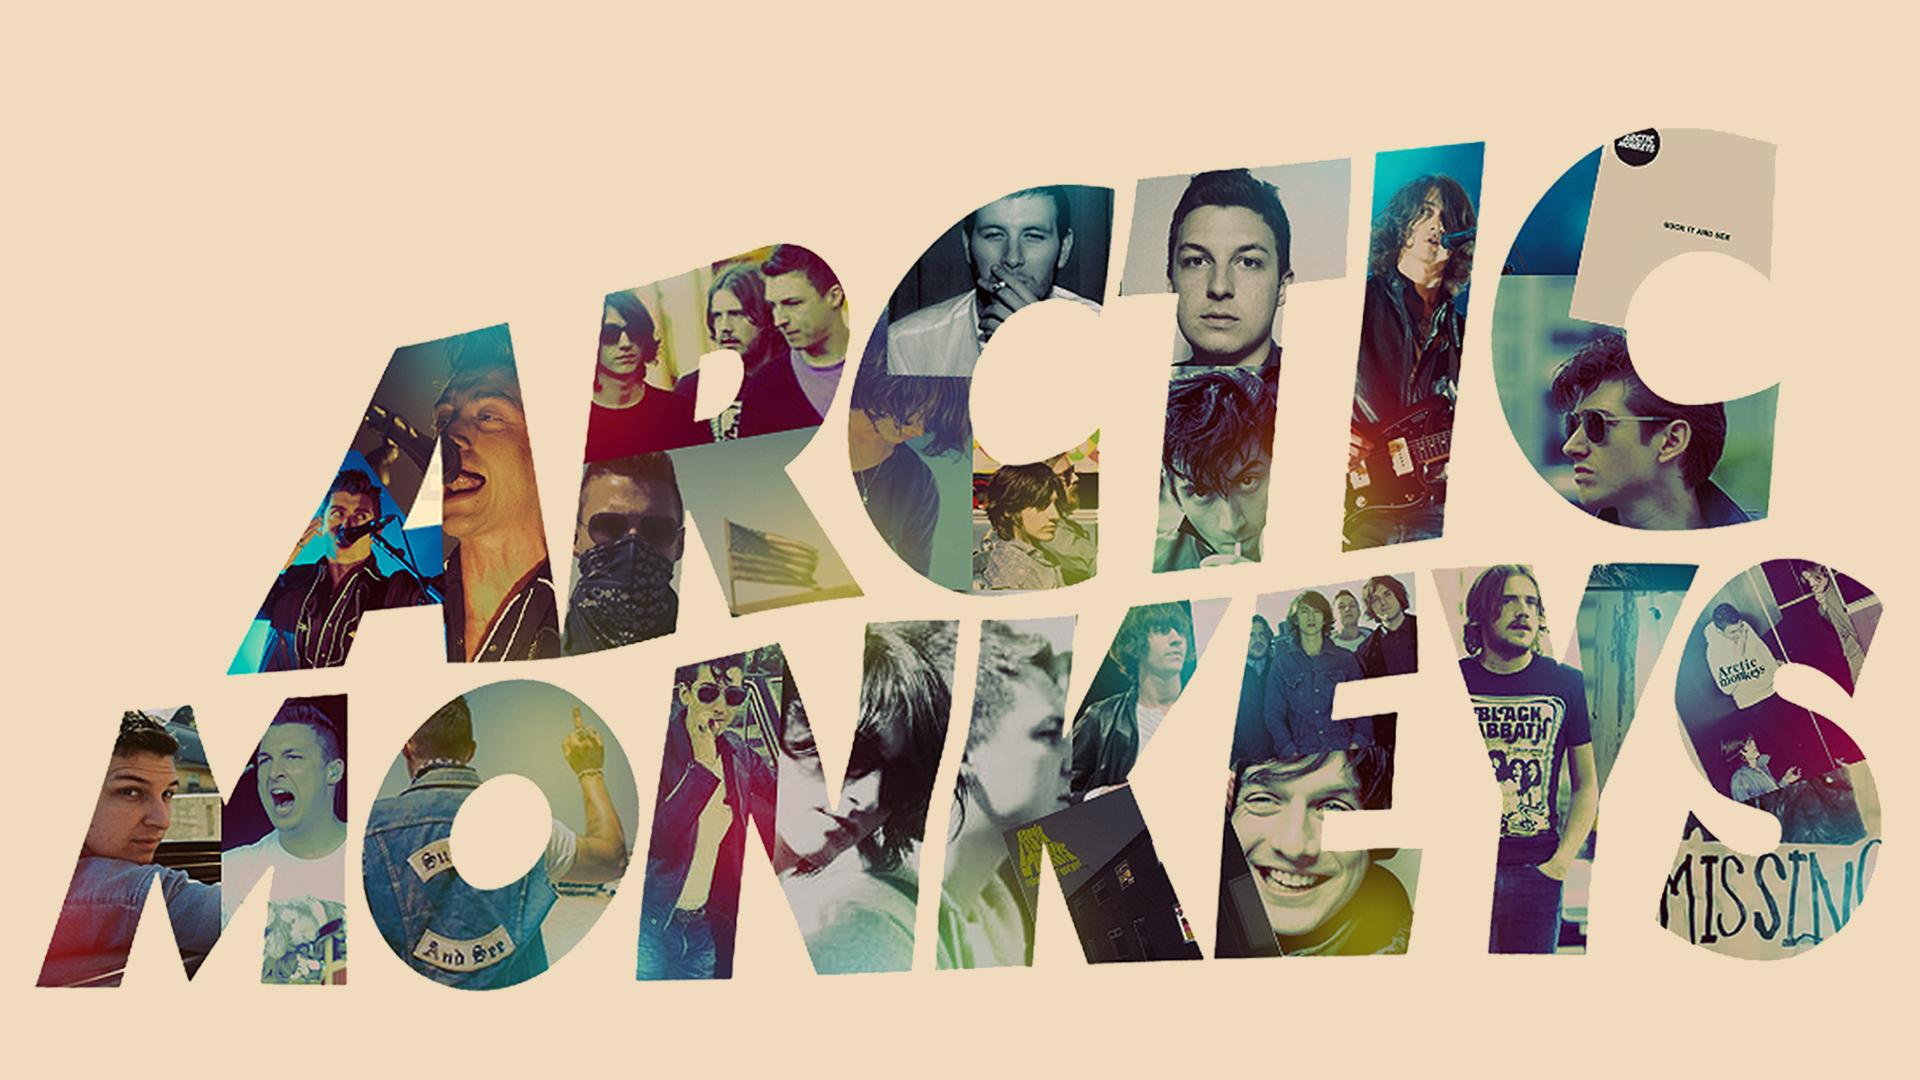 Arctic Monkeys Full HD Papel de Parede and Planos de Fundo ...